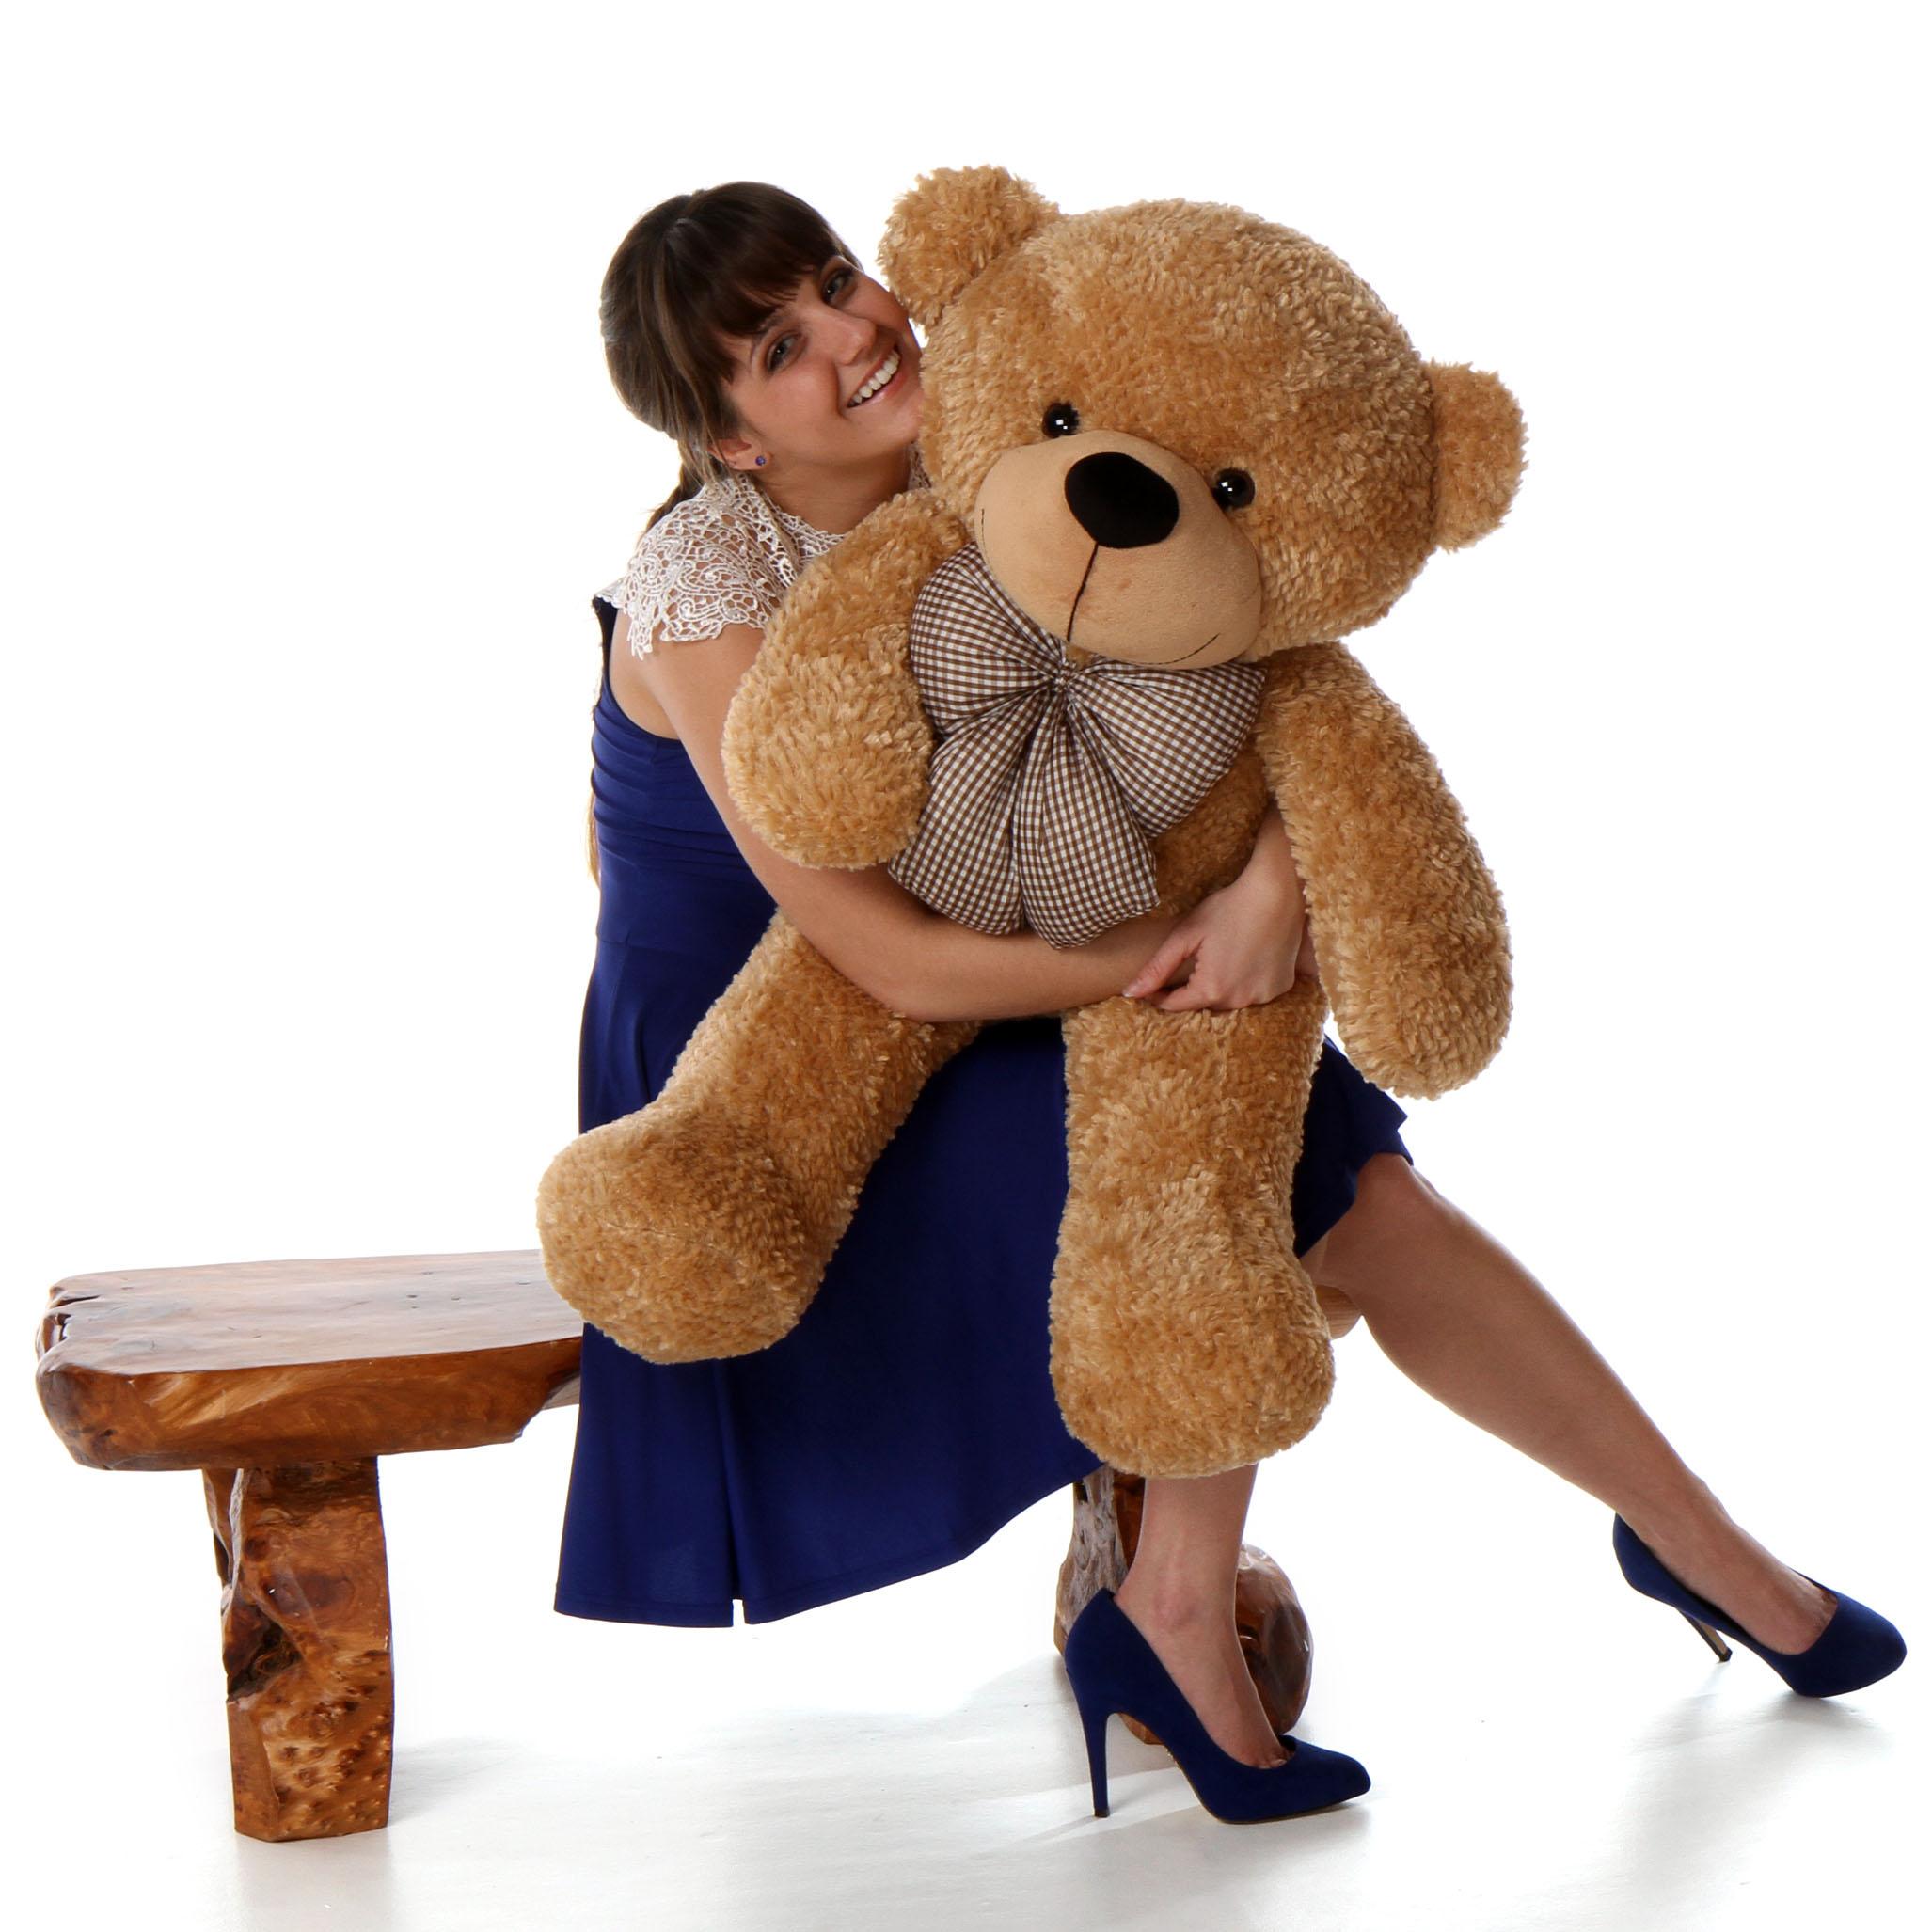 38in-huge-amber-brown-teddy-bear-shaggy-cuddles.jpg